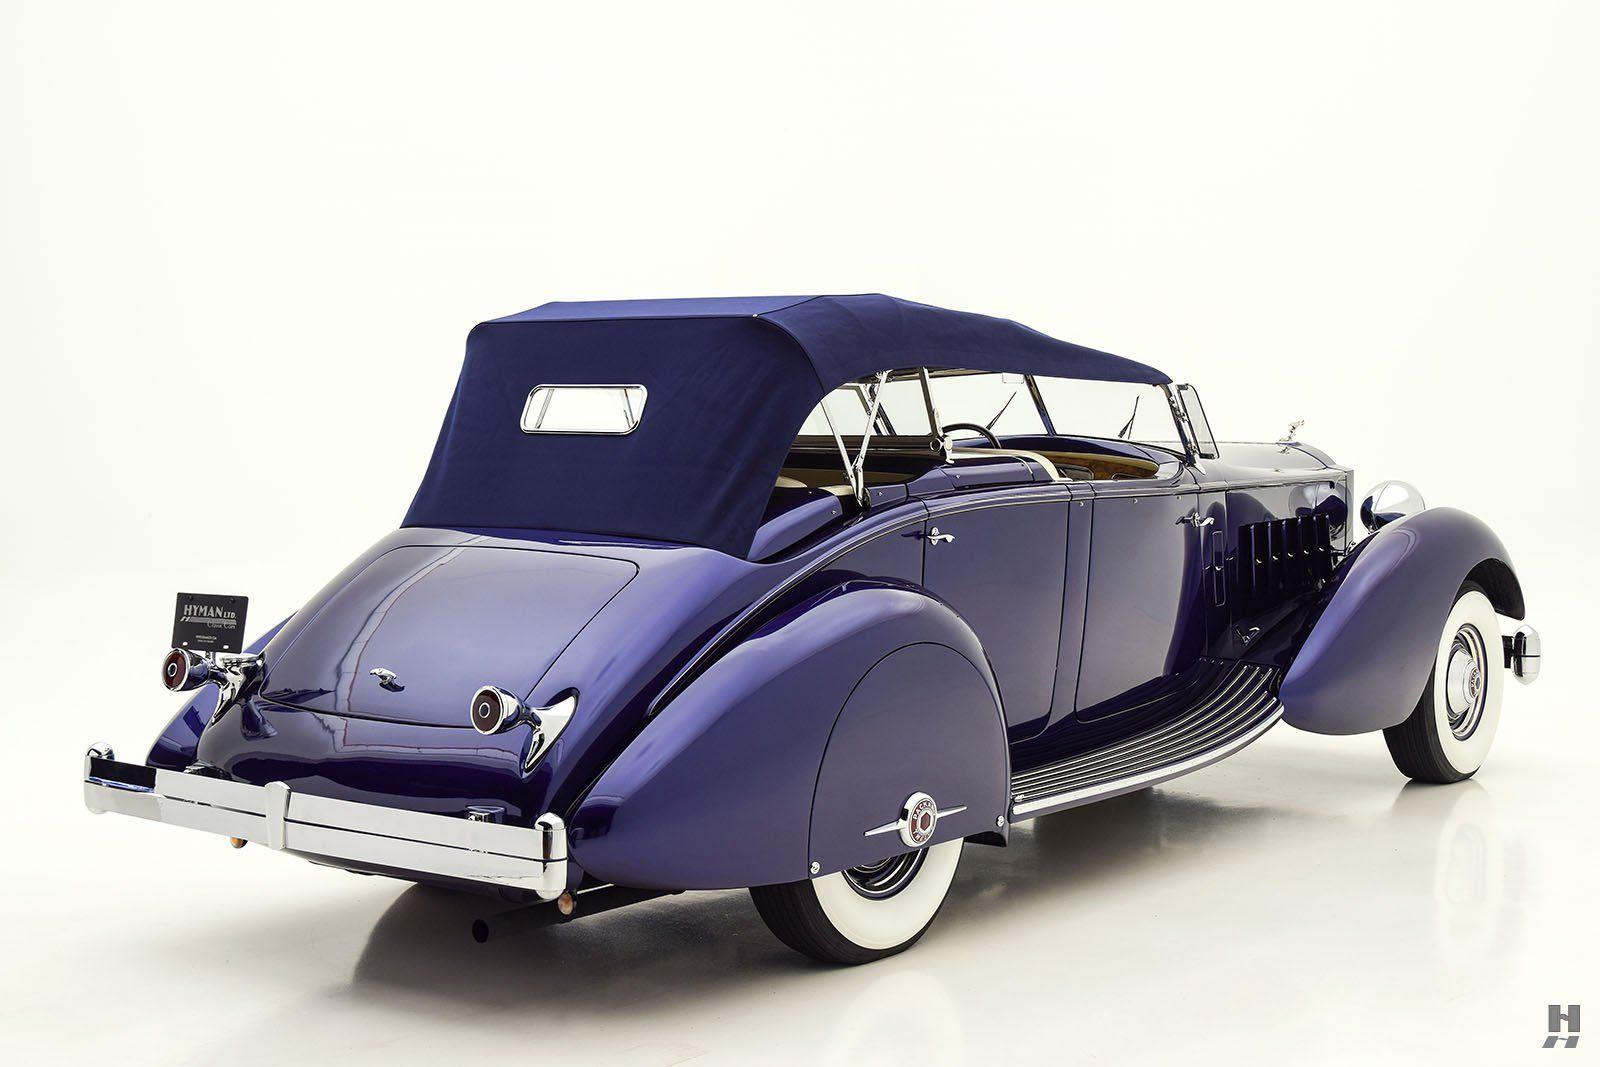 1937 Packard Twelve Dual Cowl Phaeton Classic Car For Sale | Buy ...